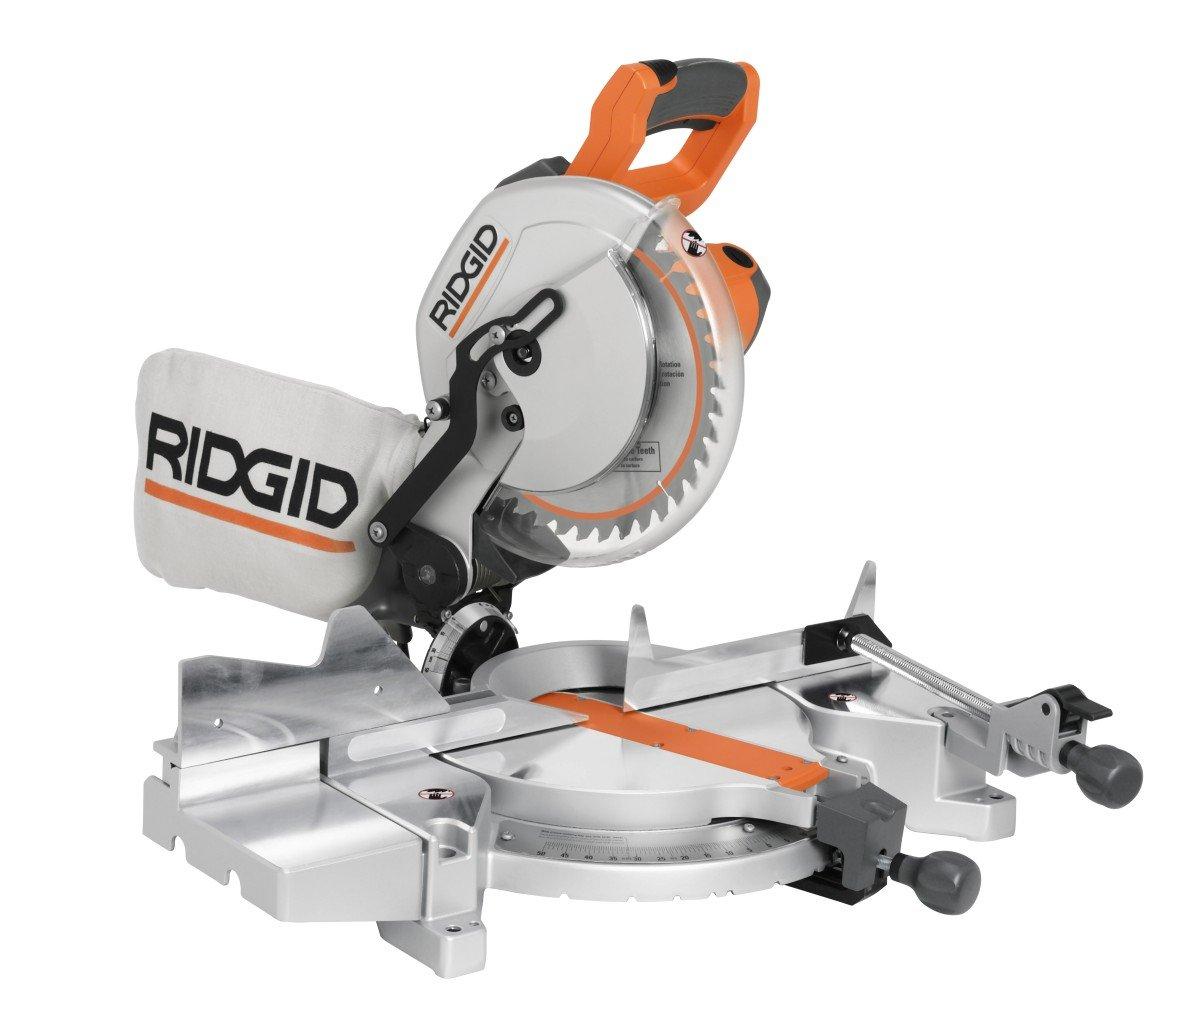 61GJ06YF5FL._SL1200_ ridgid ms1065lza saw, 10 inch compound miter with laser power